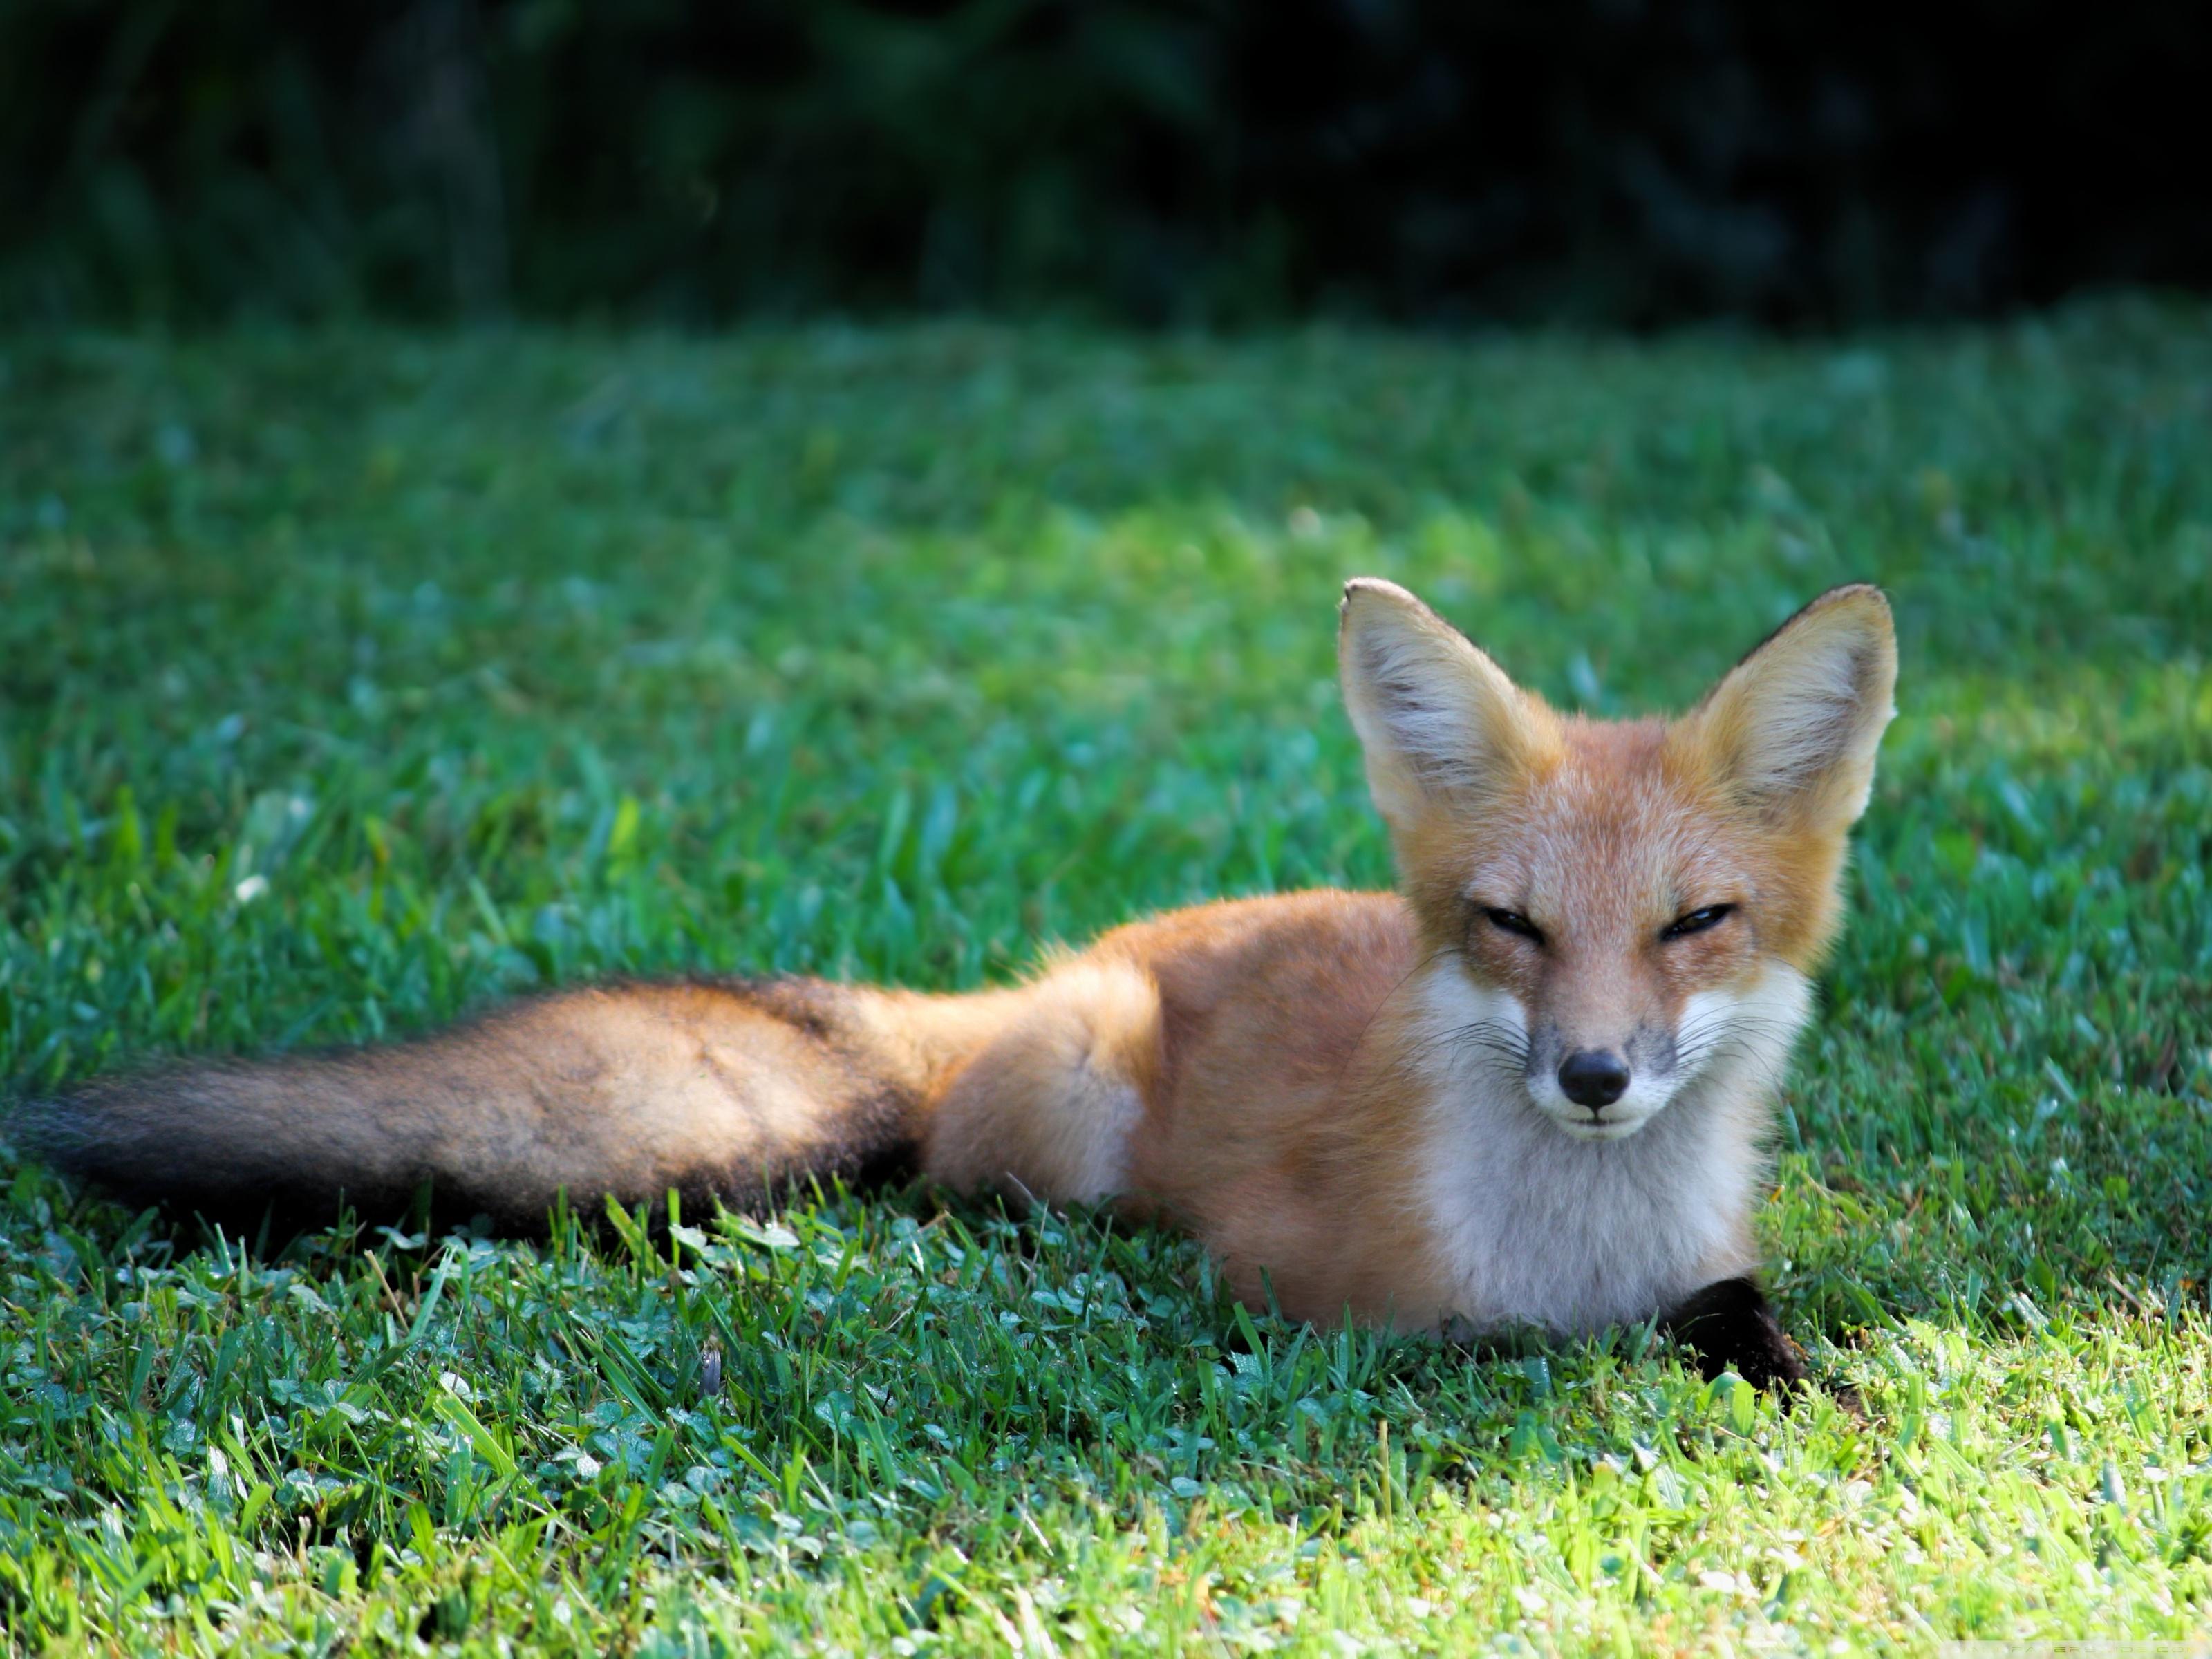 pretty_red_fox-wallpaper-3200x2400.jpg